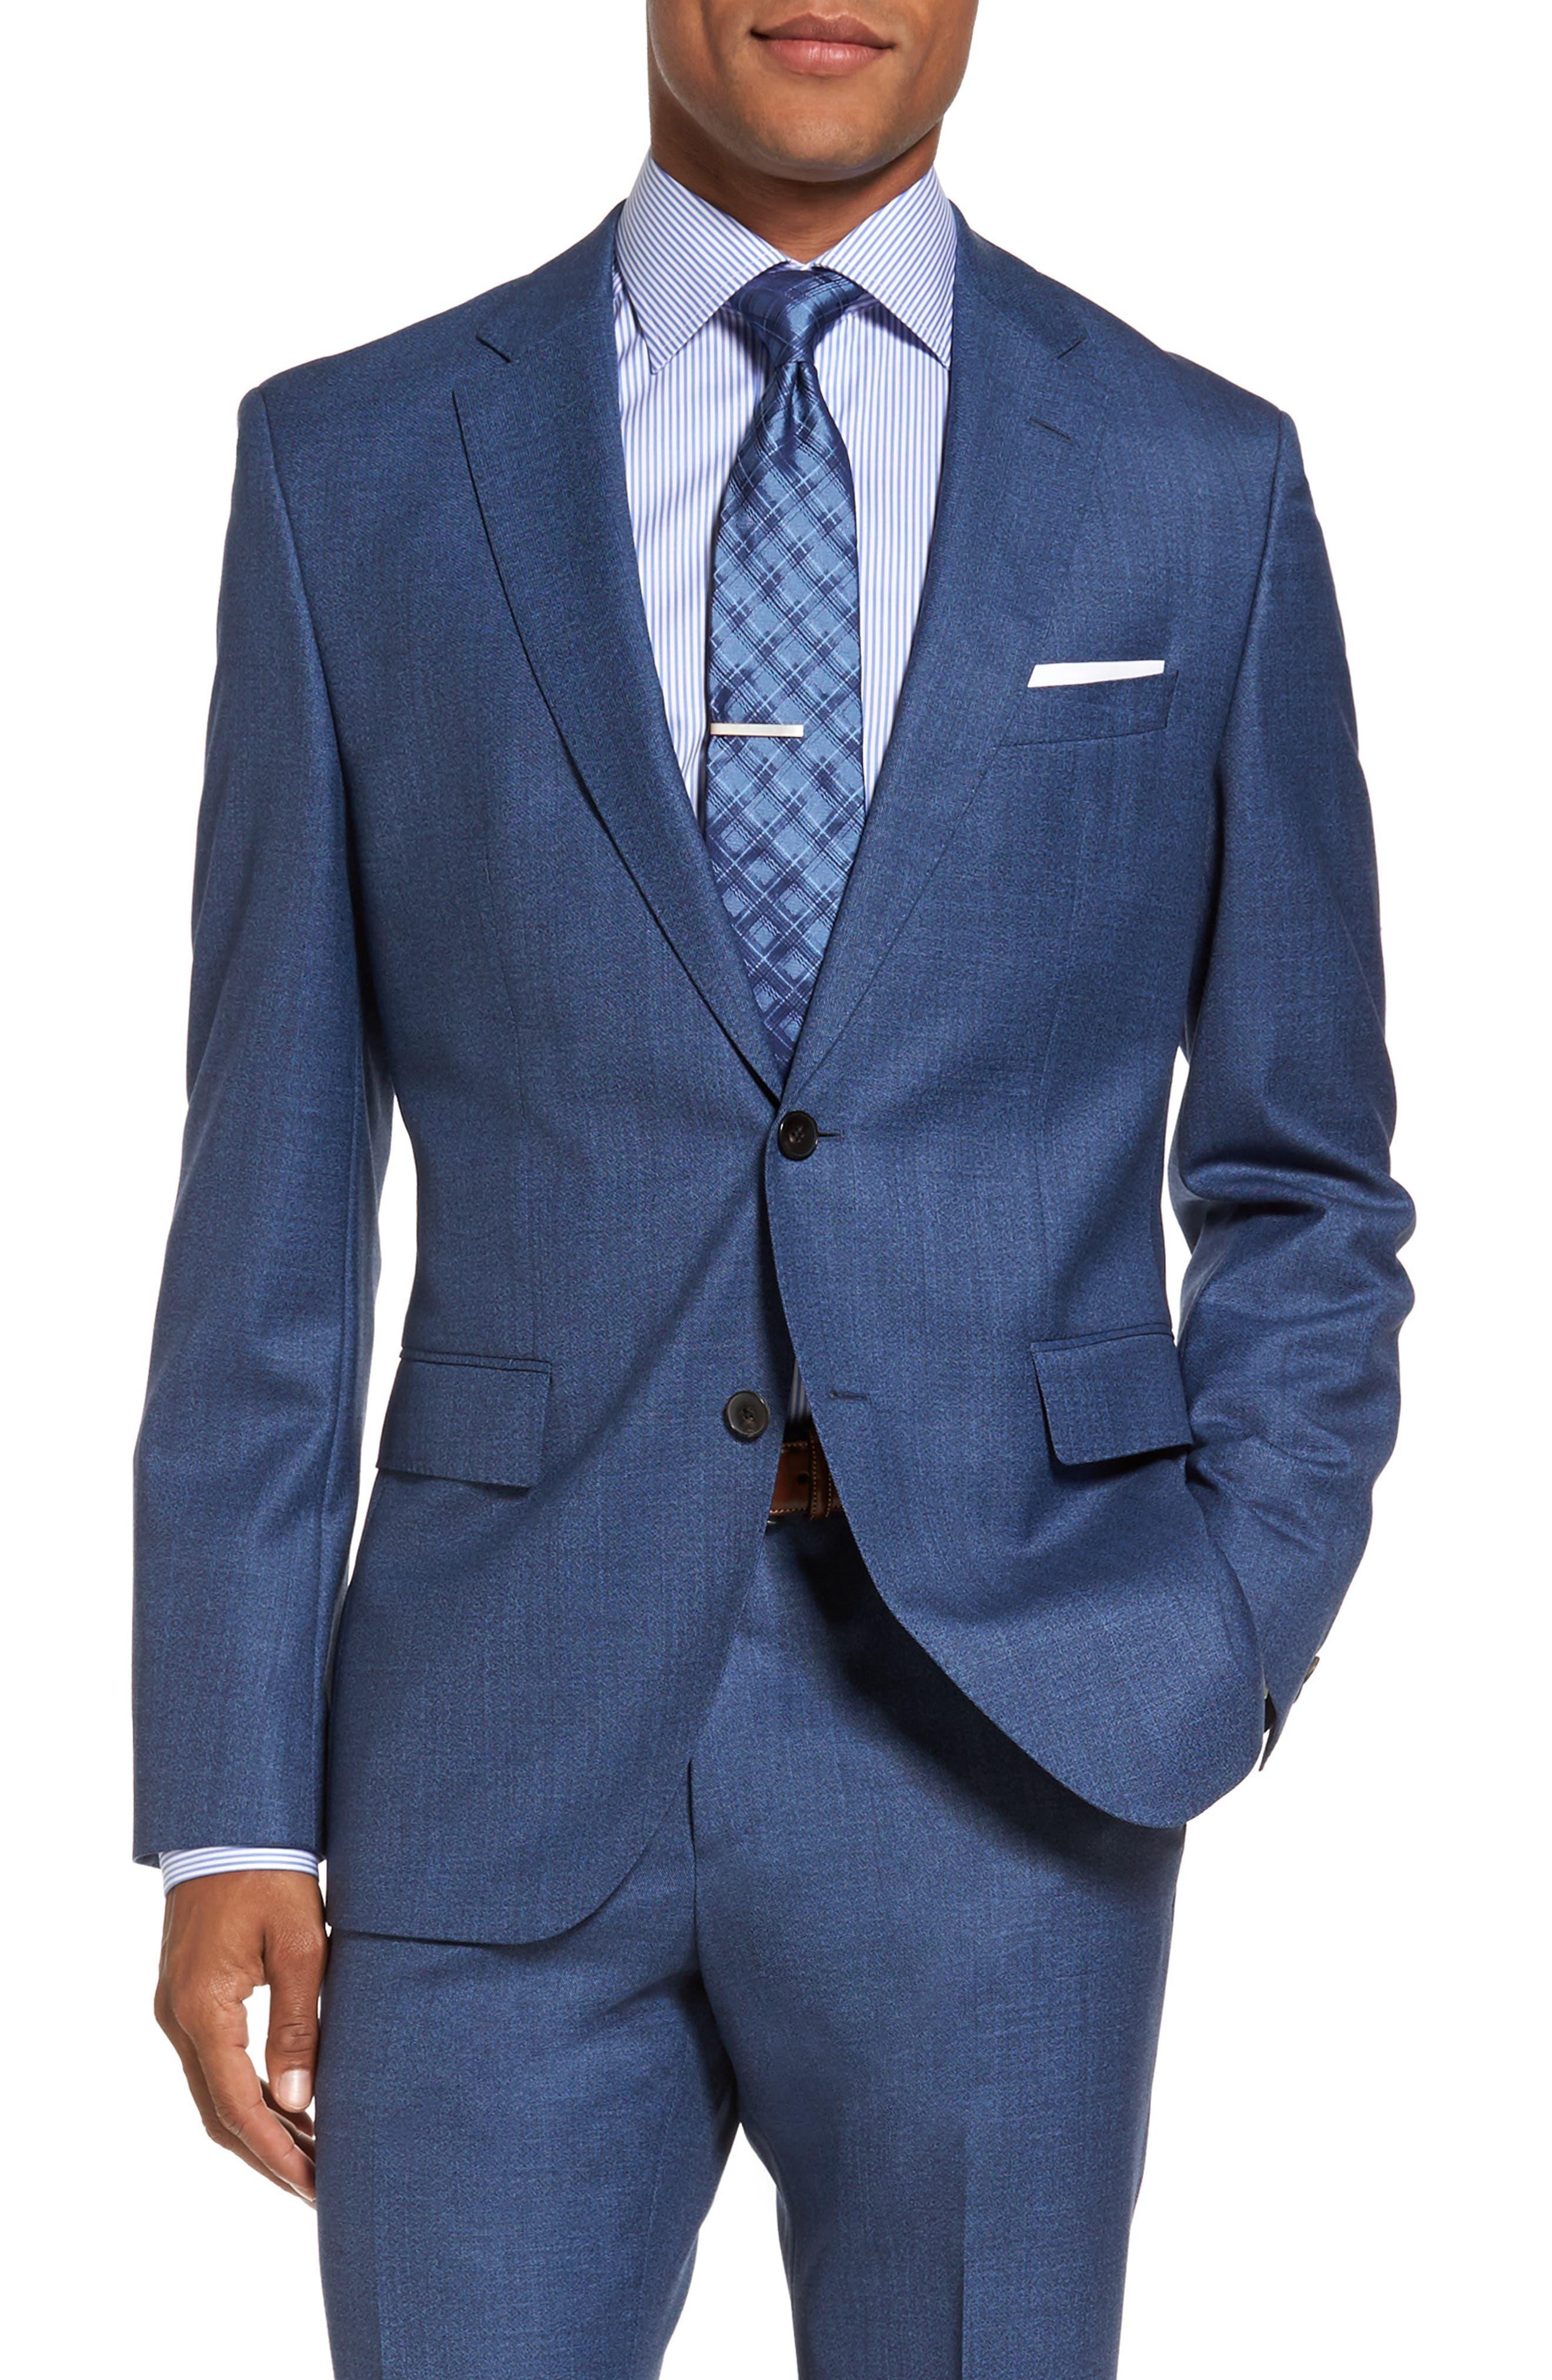 Johnstons/Lenon Classic Fit Solid Wool Suit,                             Alternate thumbnail 5, color,                             Medium Blue